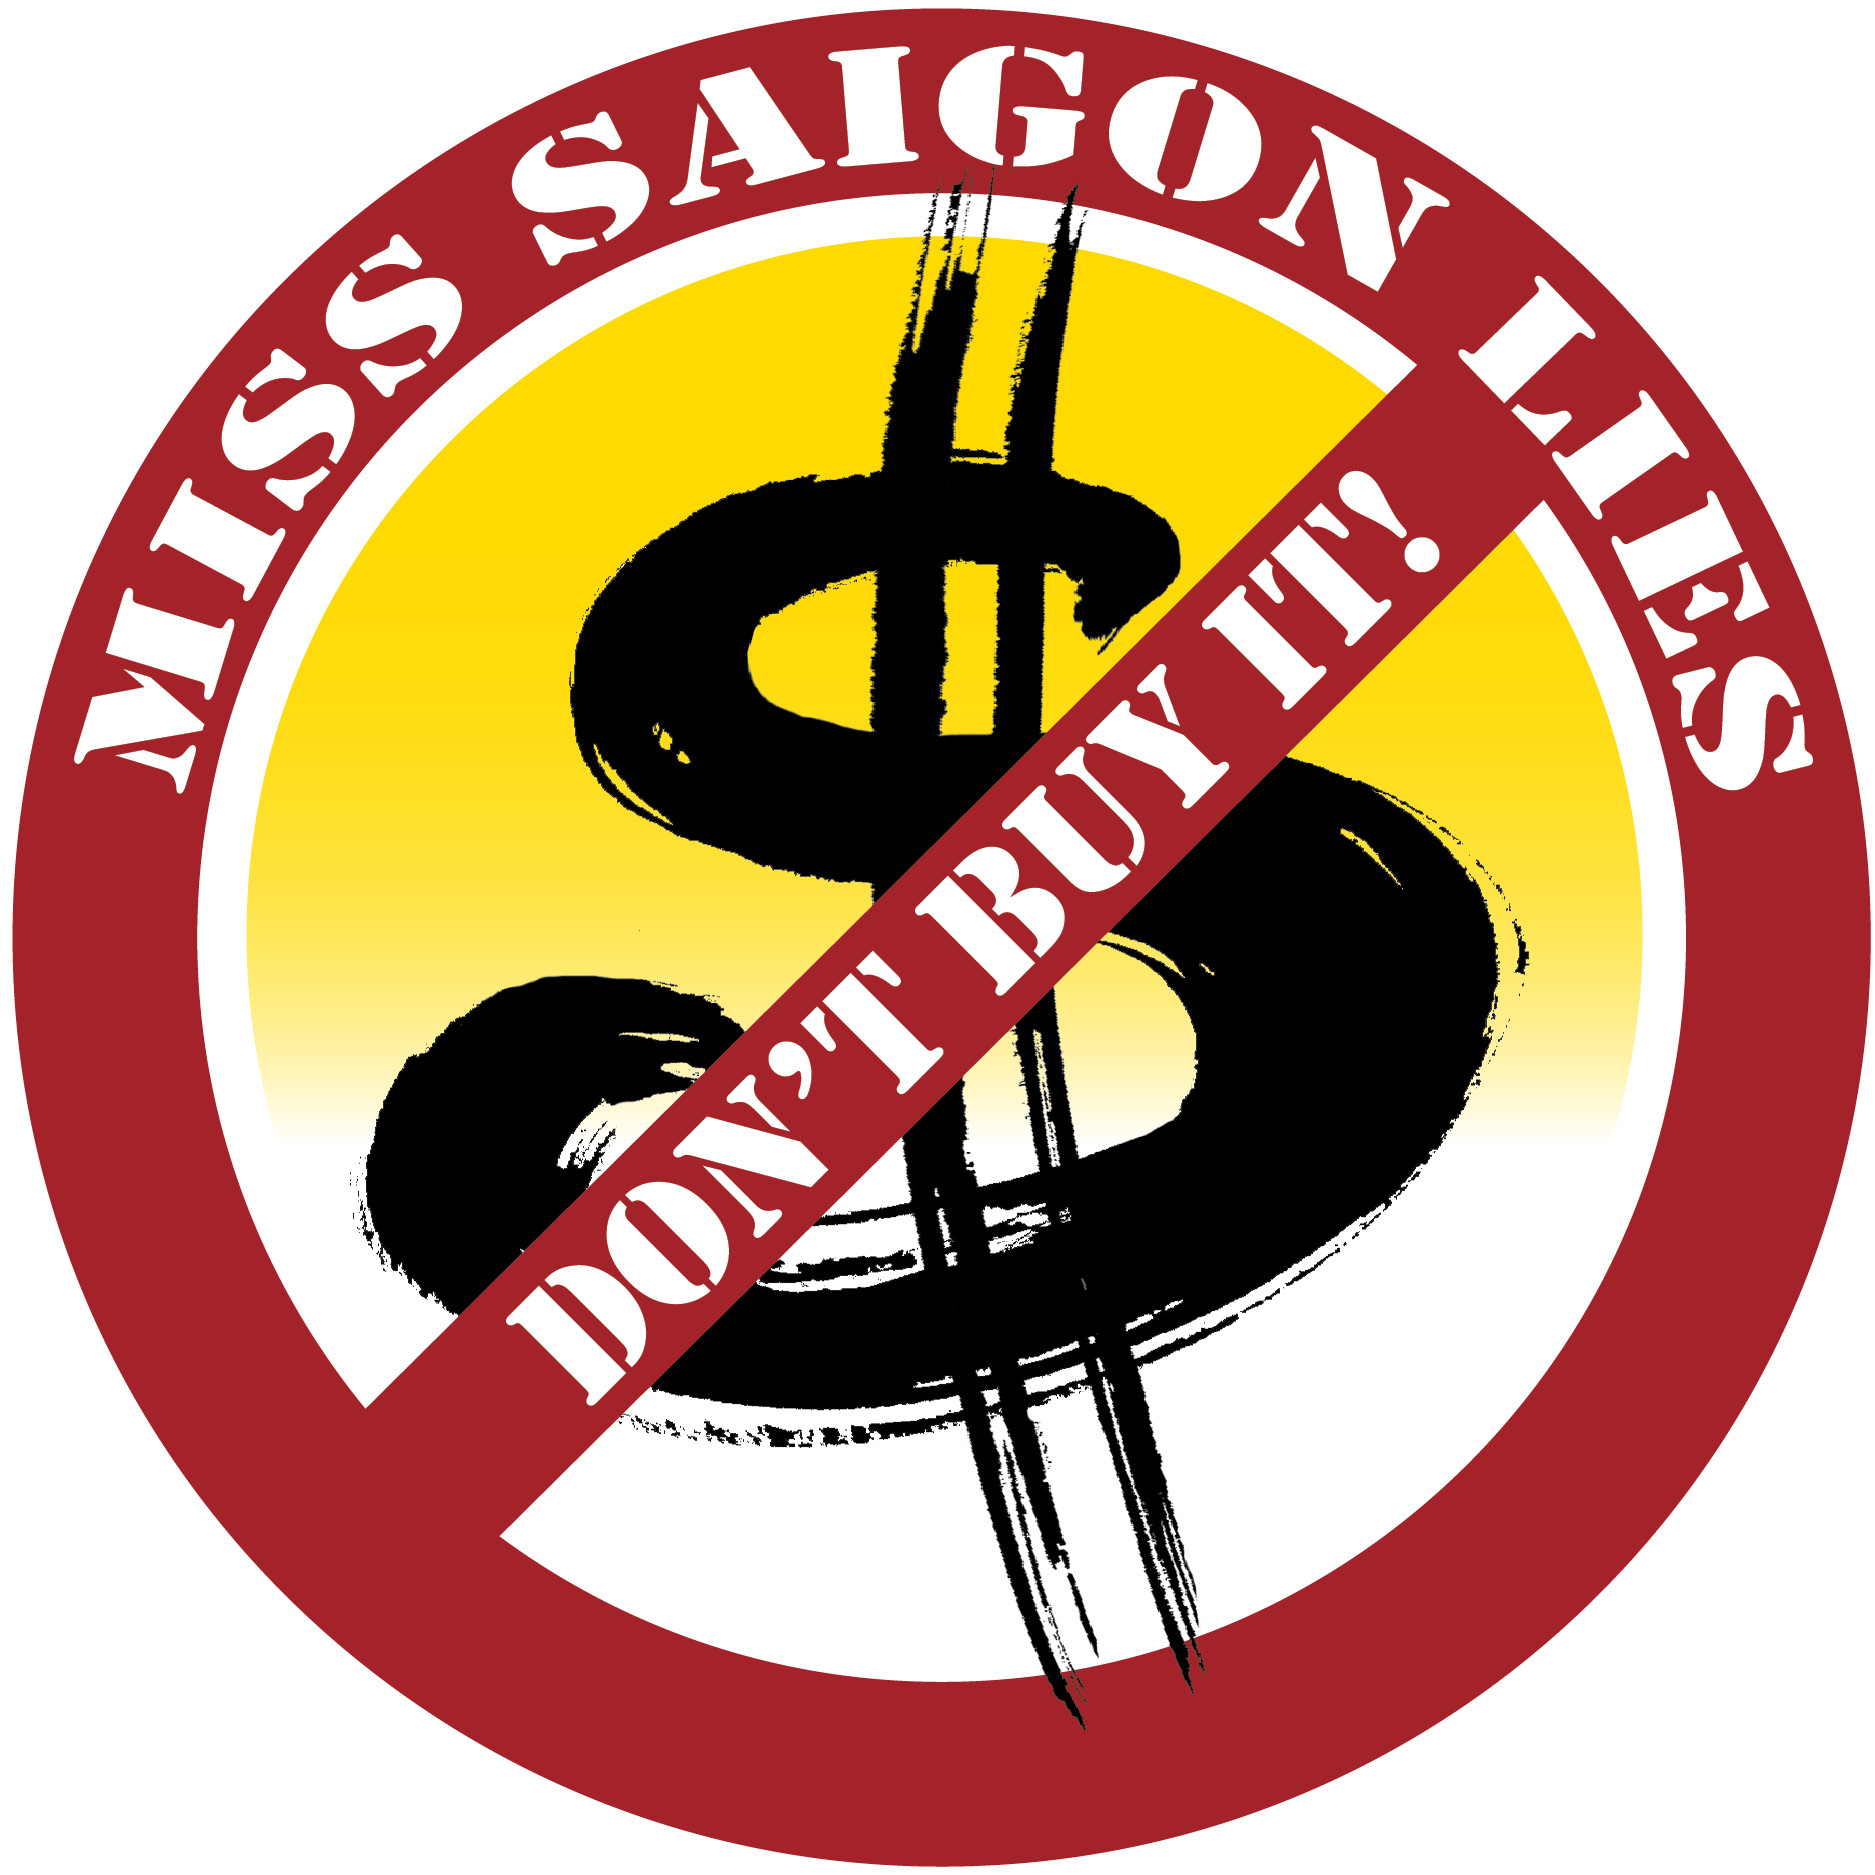 Don't Buy Miss Saigon